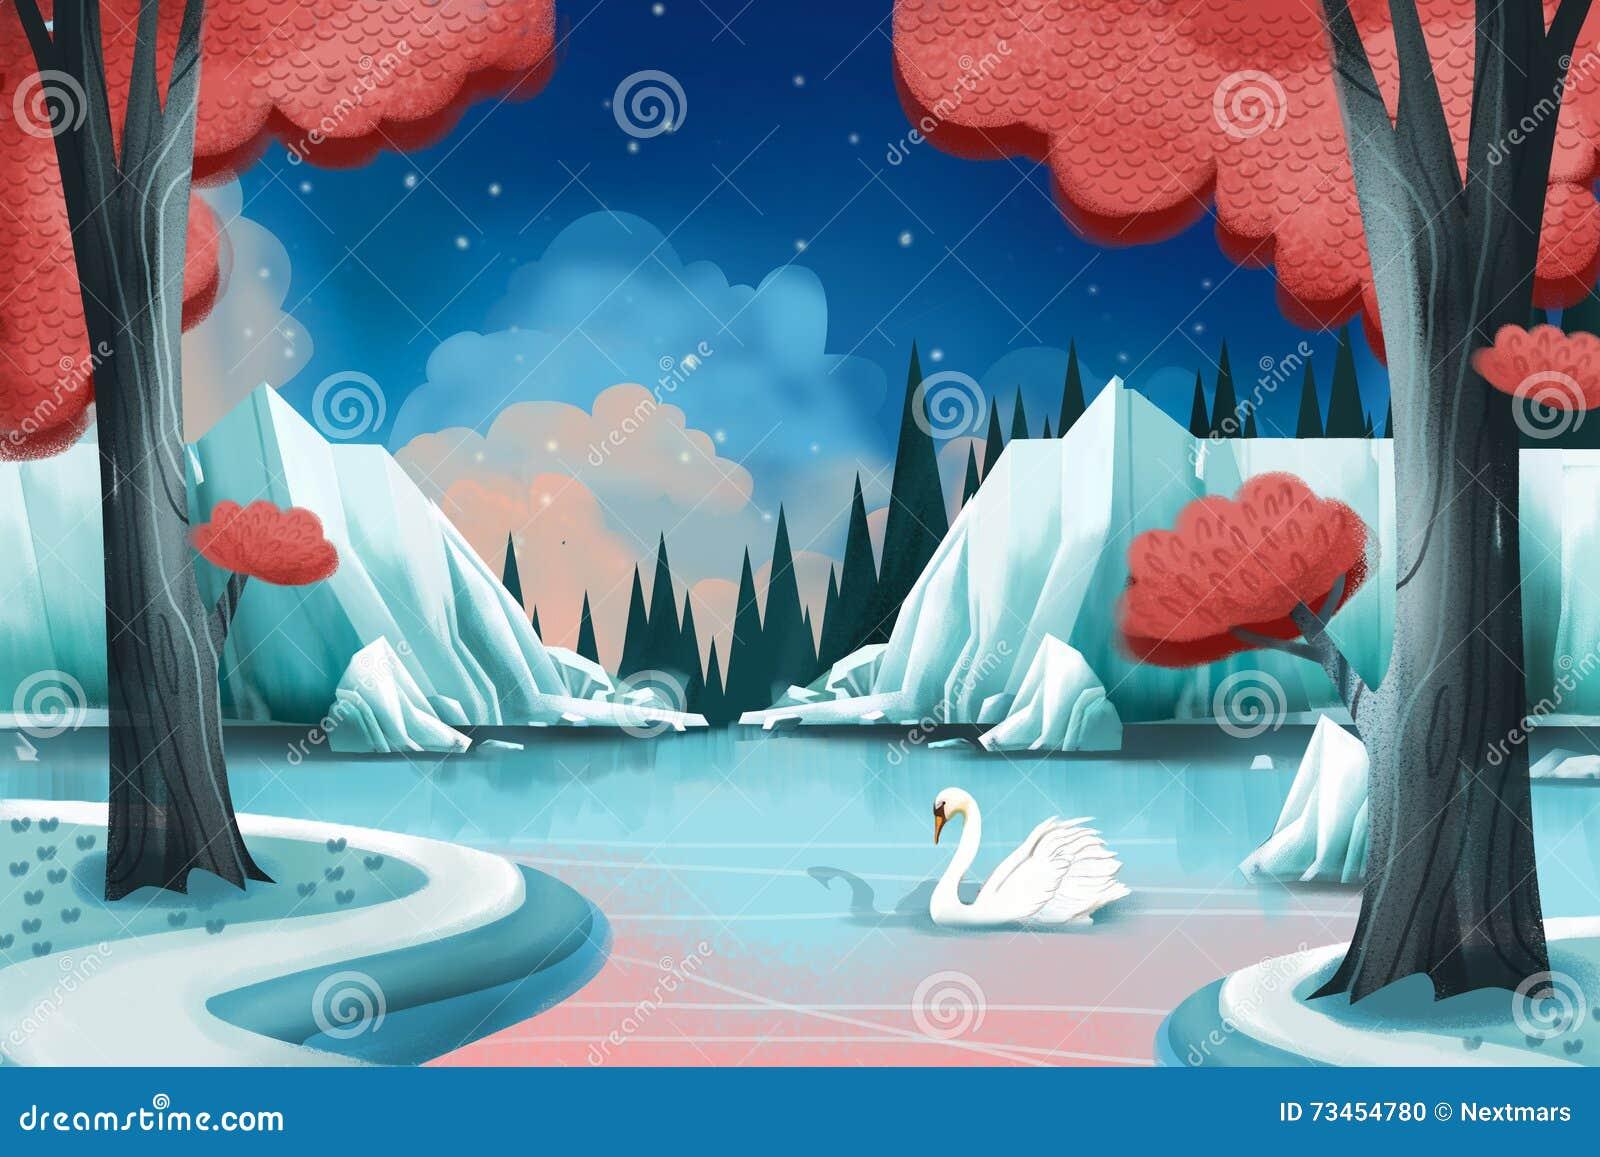 Creative Illustration and Innovative Art: Swan Lake.